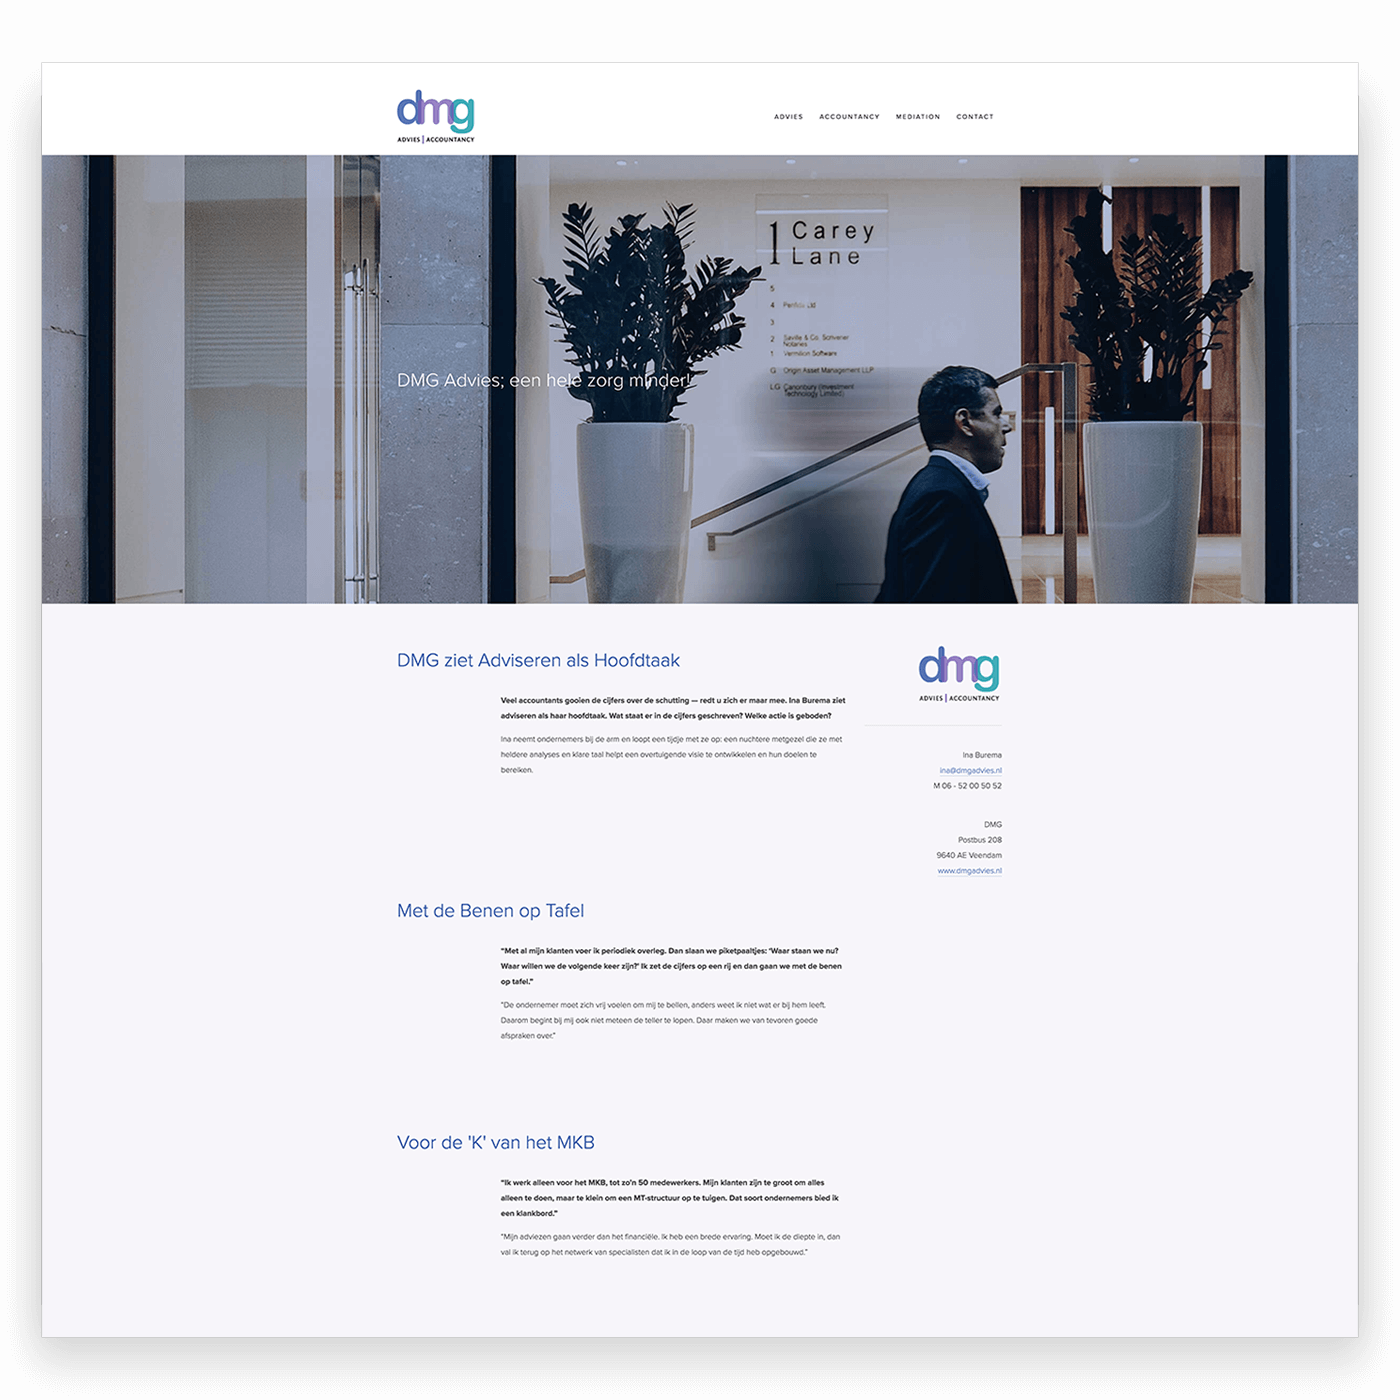 dmg_website.png